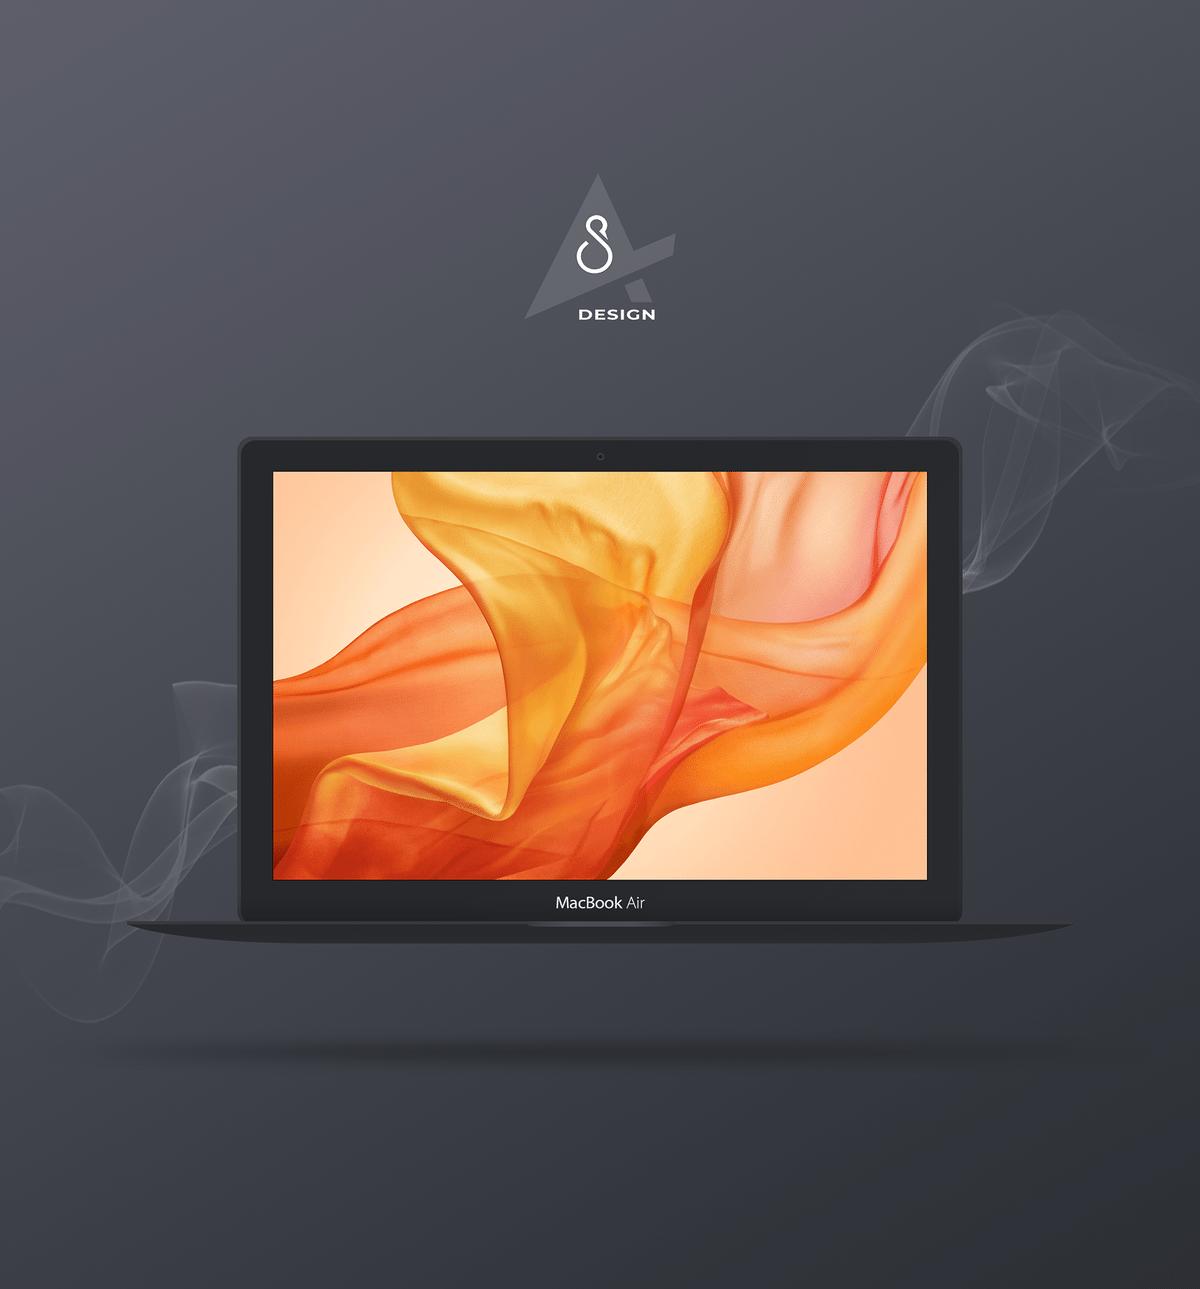 60+ Apple Macbook / PRO & Air Mockup Templates | Decolore Net